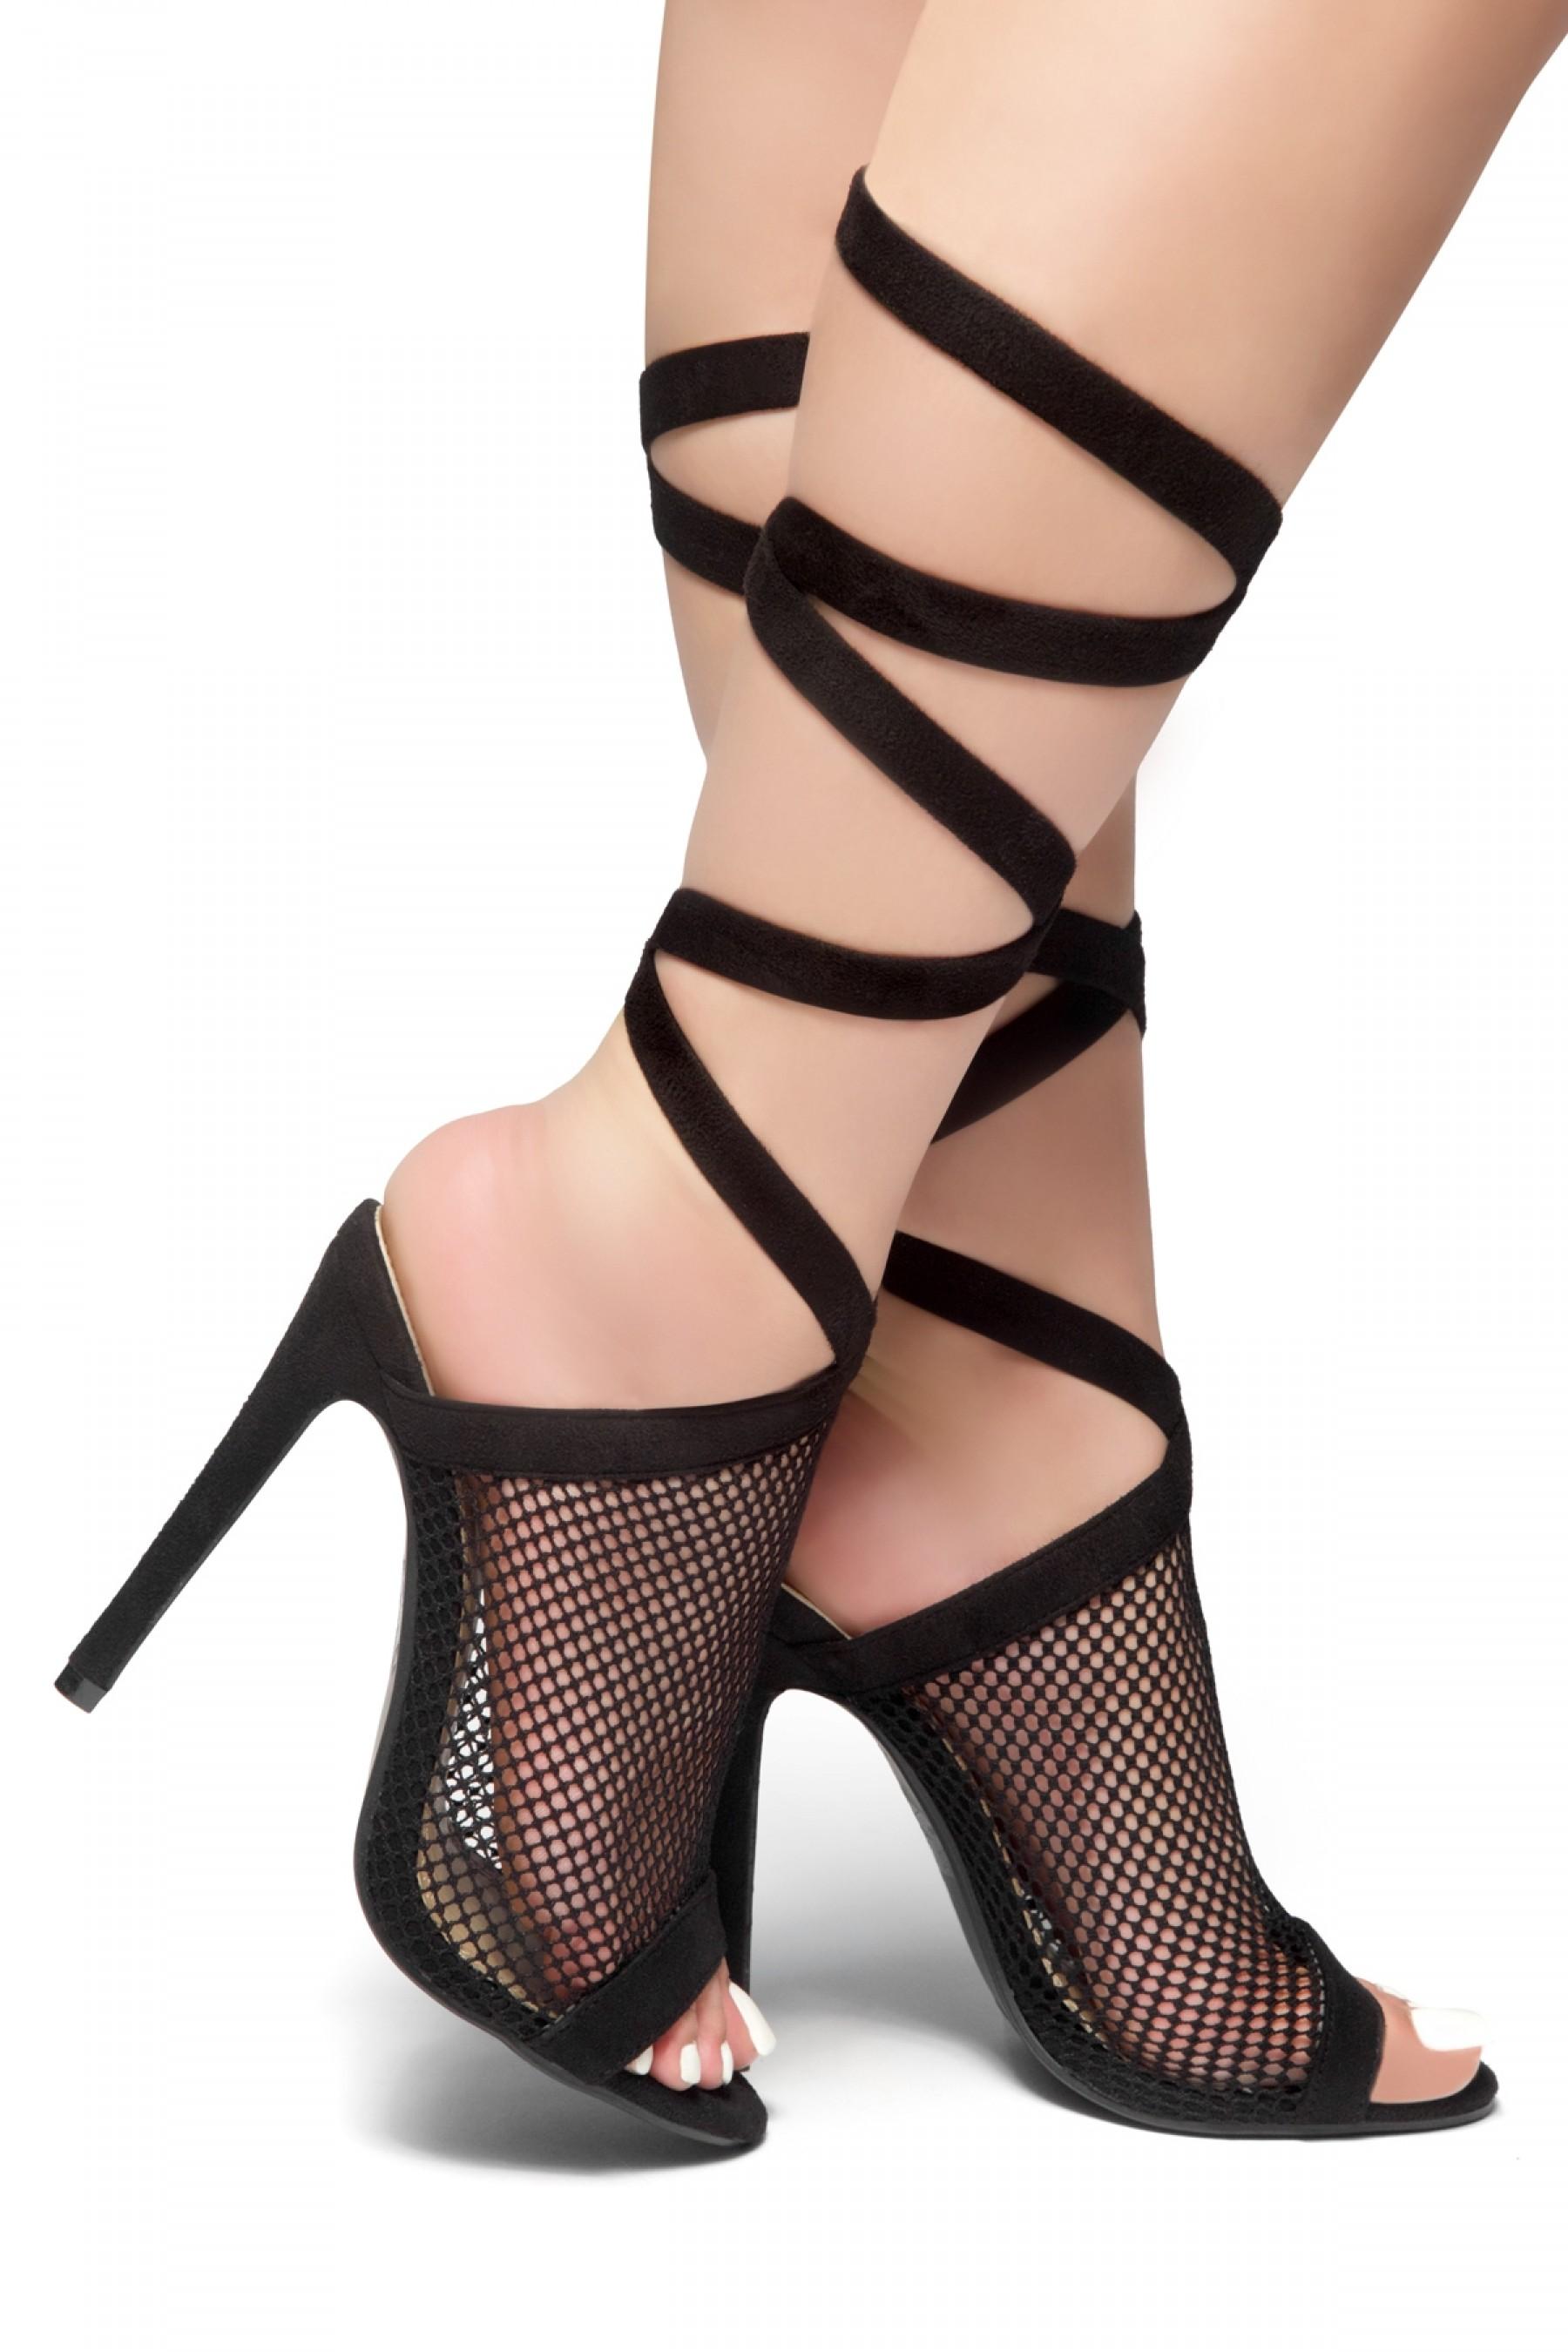 HerStyle Trend Setter- Stiletto Heel, Wraparound Ankle Tie Sandal  (BlackBlack)